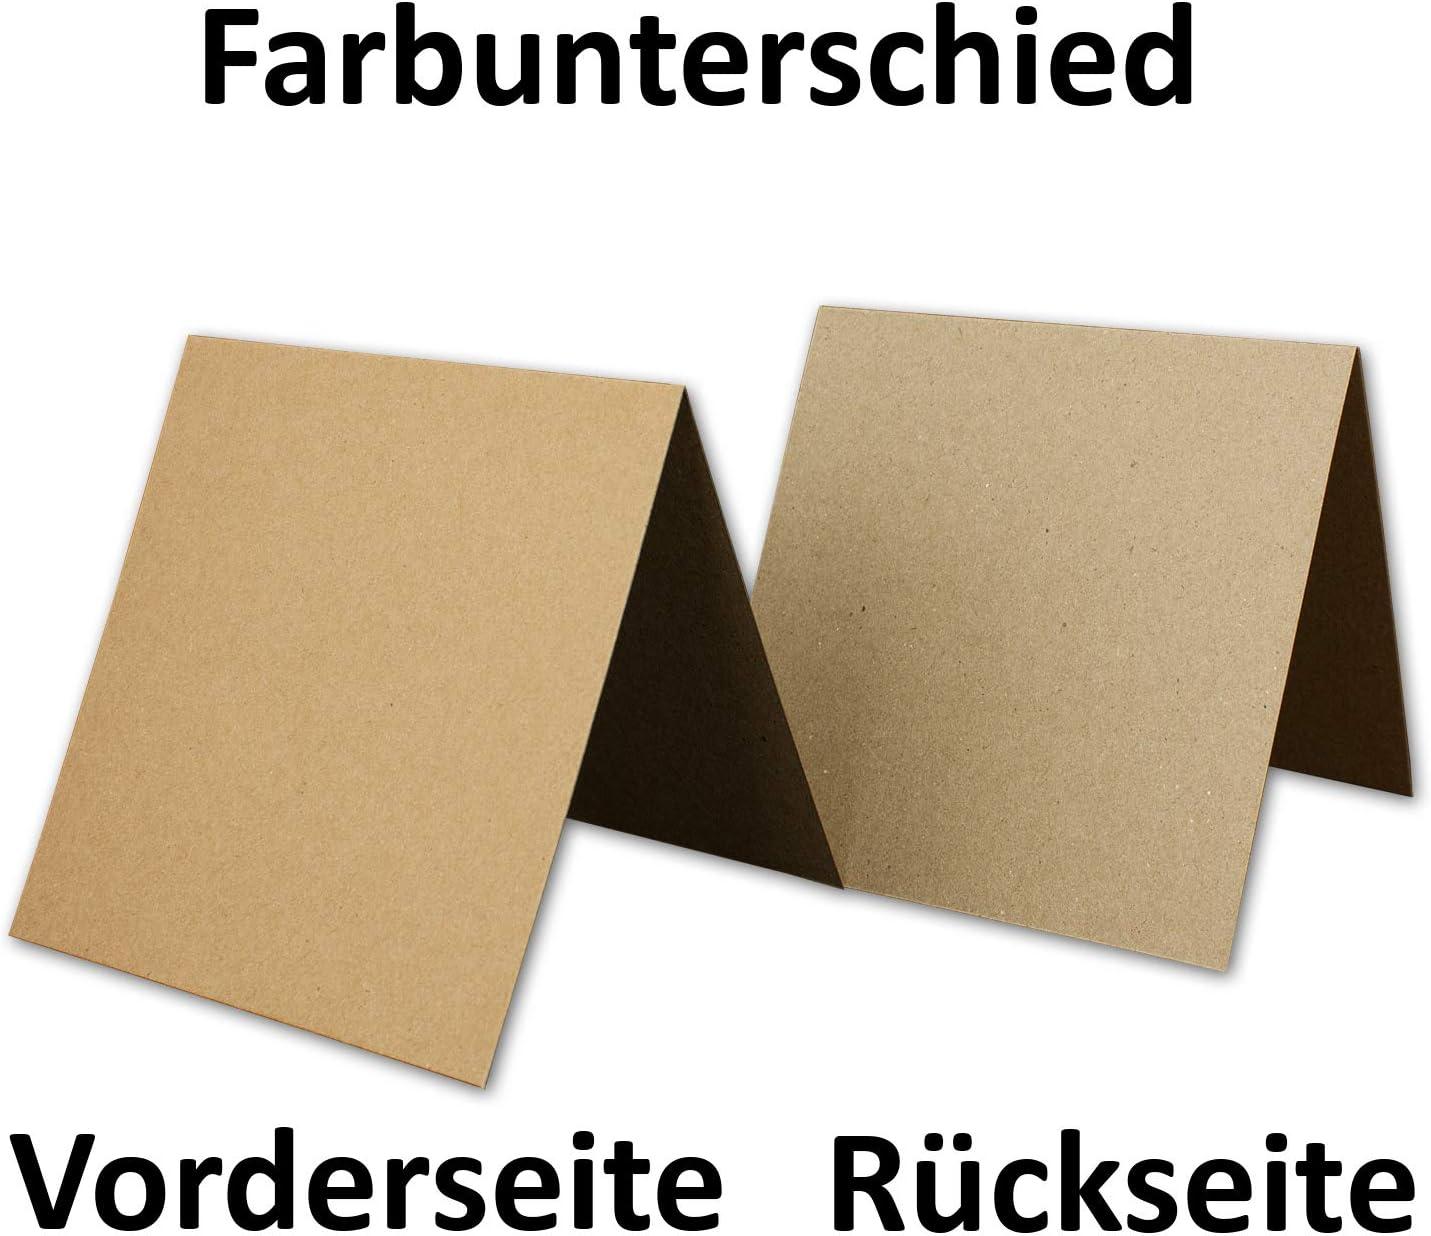 Set da 100 buste in carta kraft riciclata da 13 cm a tinta unita quadrate colore: marrone naturale.